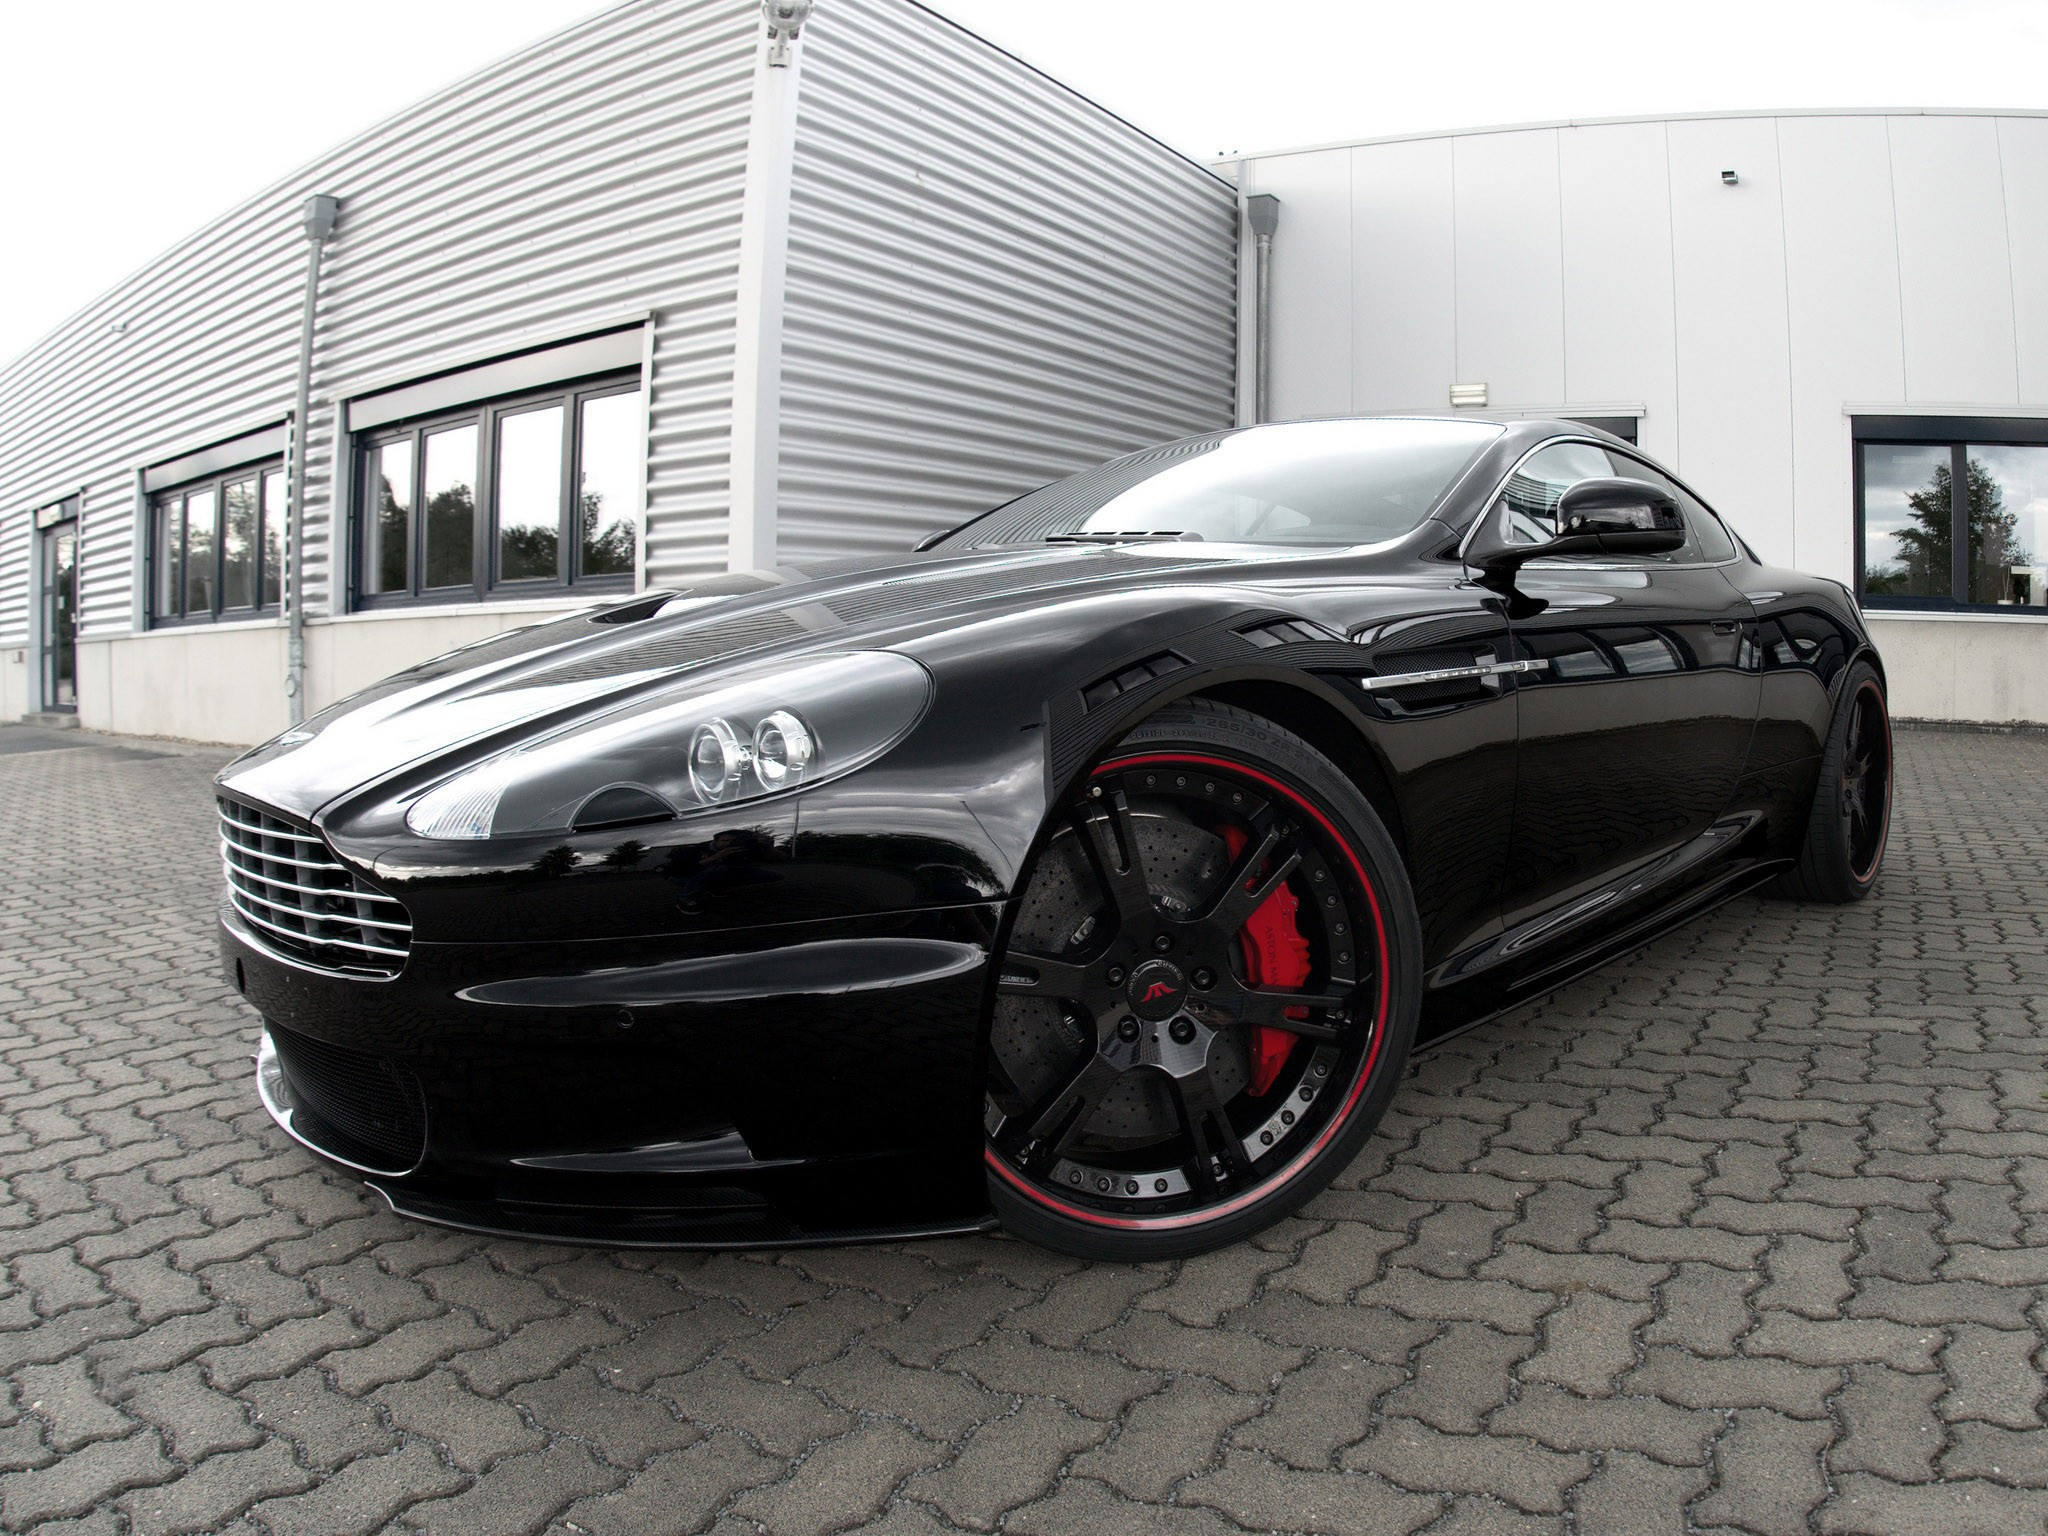 2012 Wheelsandmore Aston Martin DBS Carbon Edition